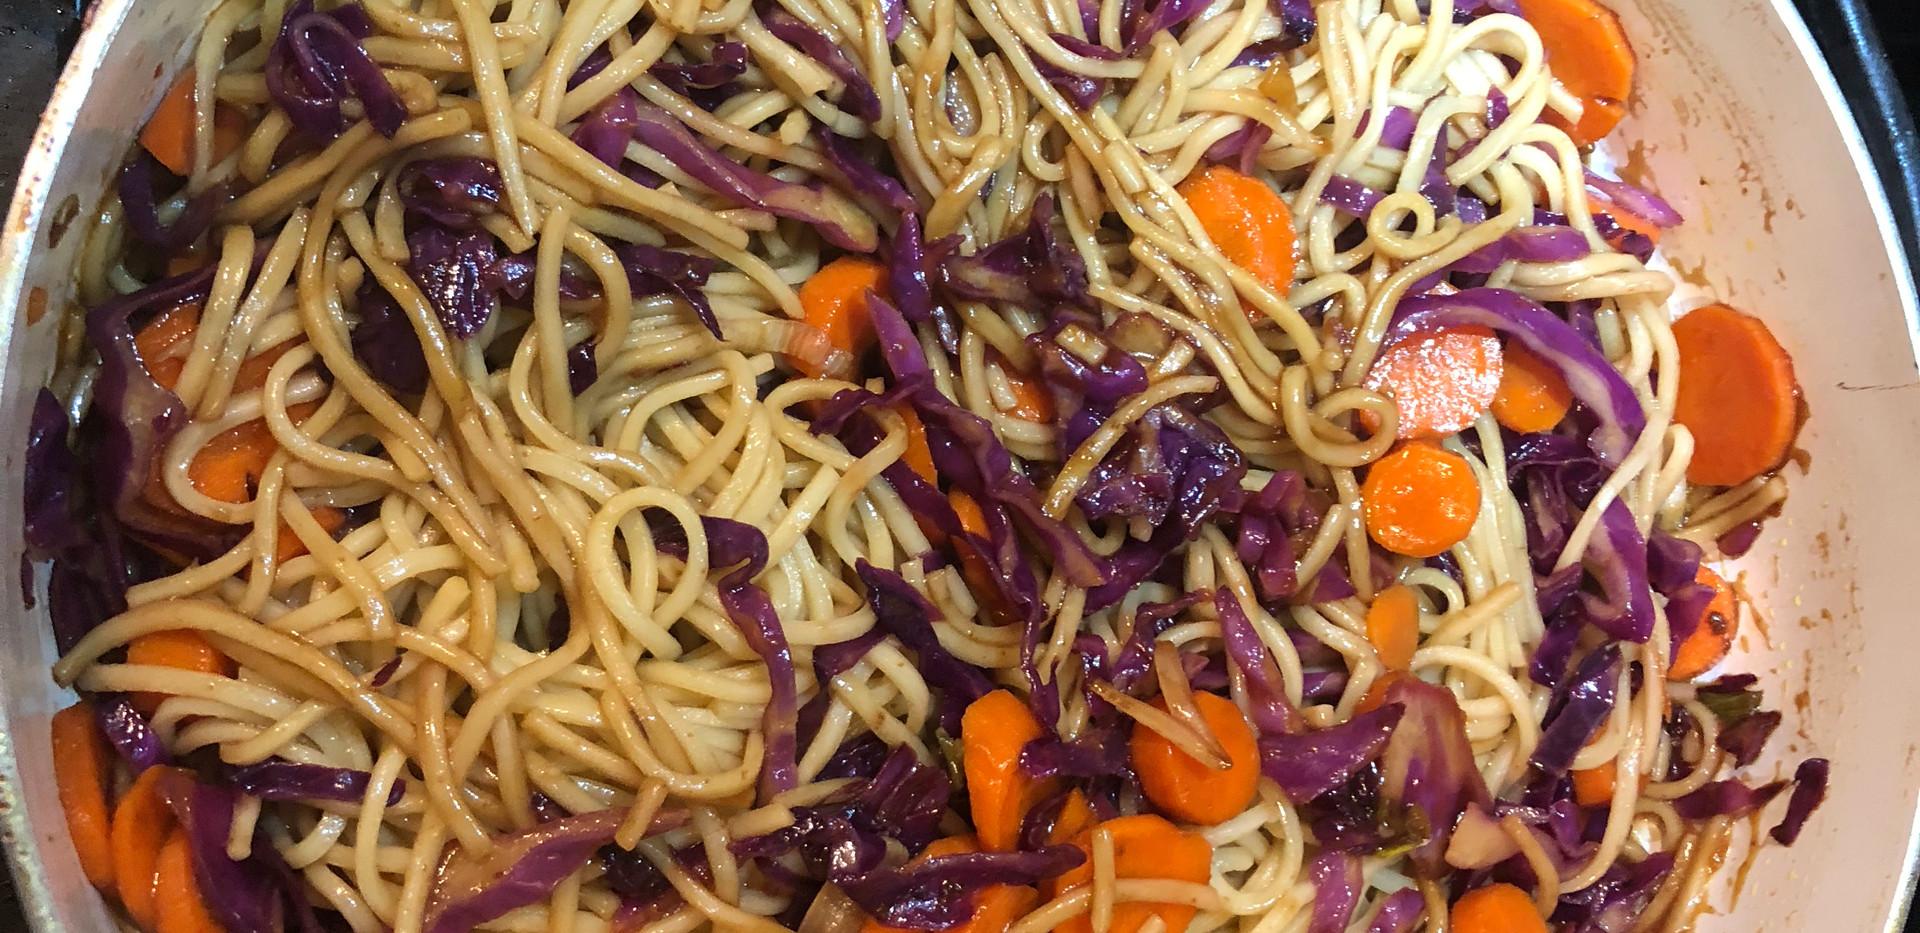 orange teryaki noodles